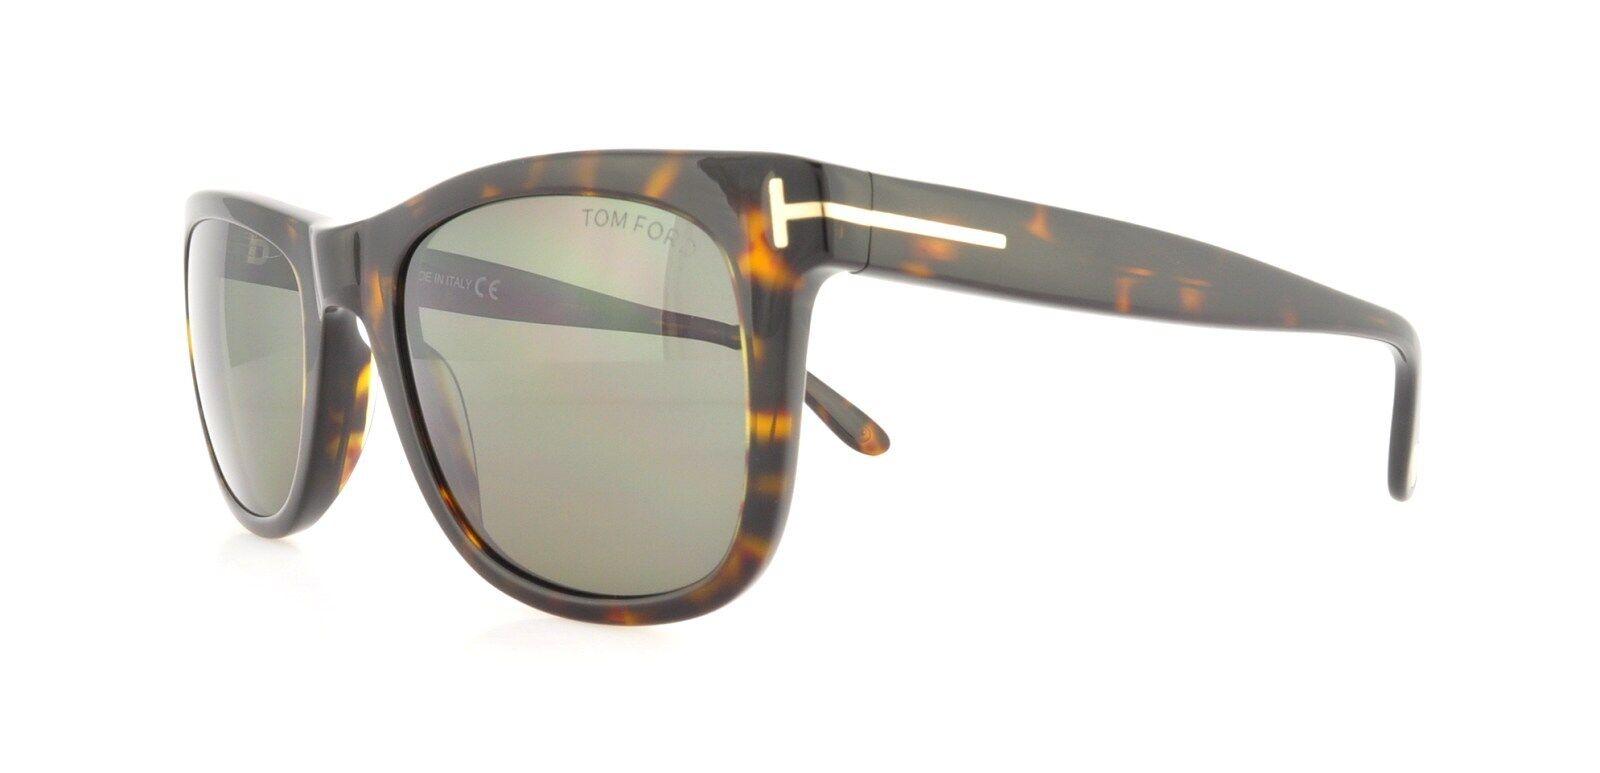 938372f1368 Tom Ford Leo 336 Wayfarer Leo Havana Polarized Sunglasses for sale ...